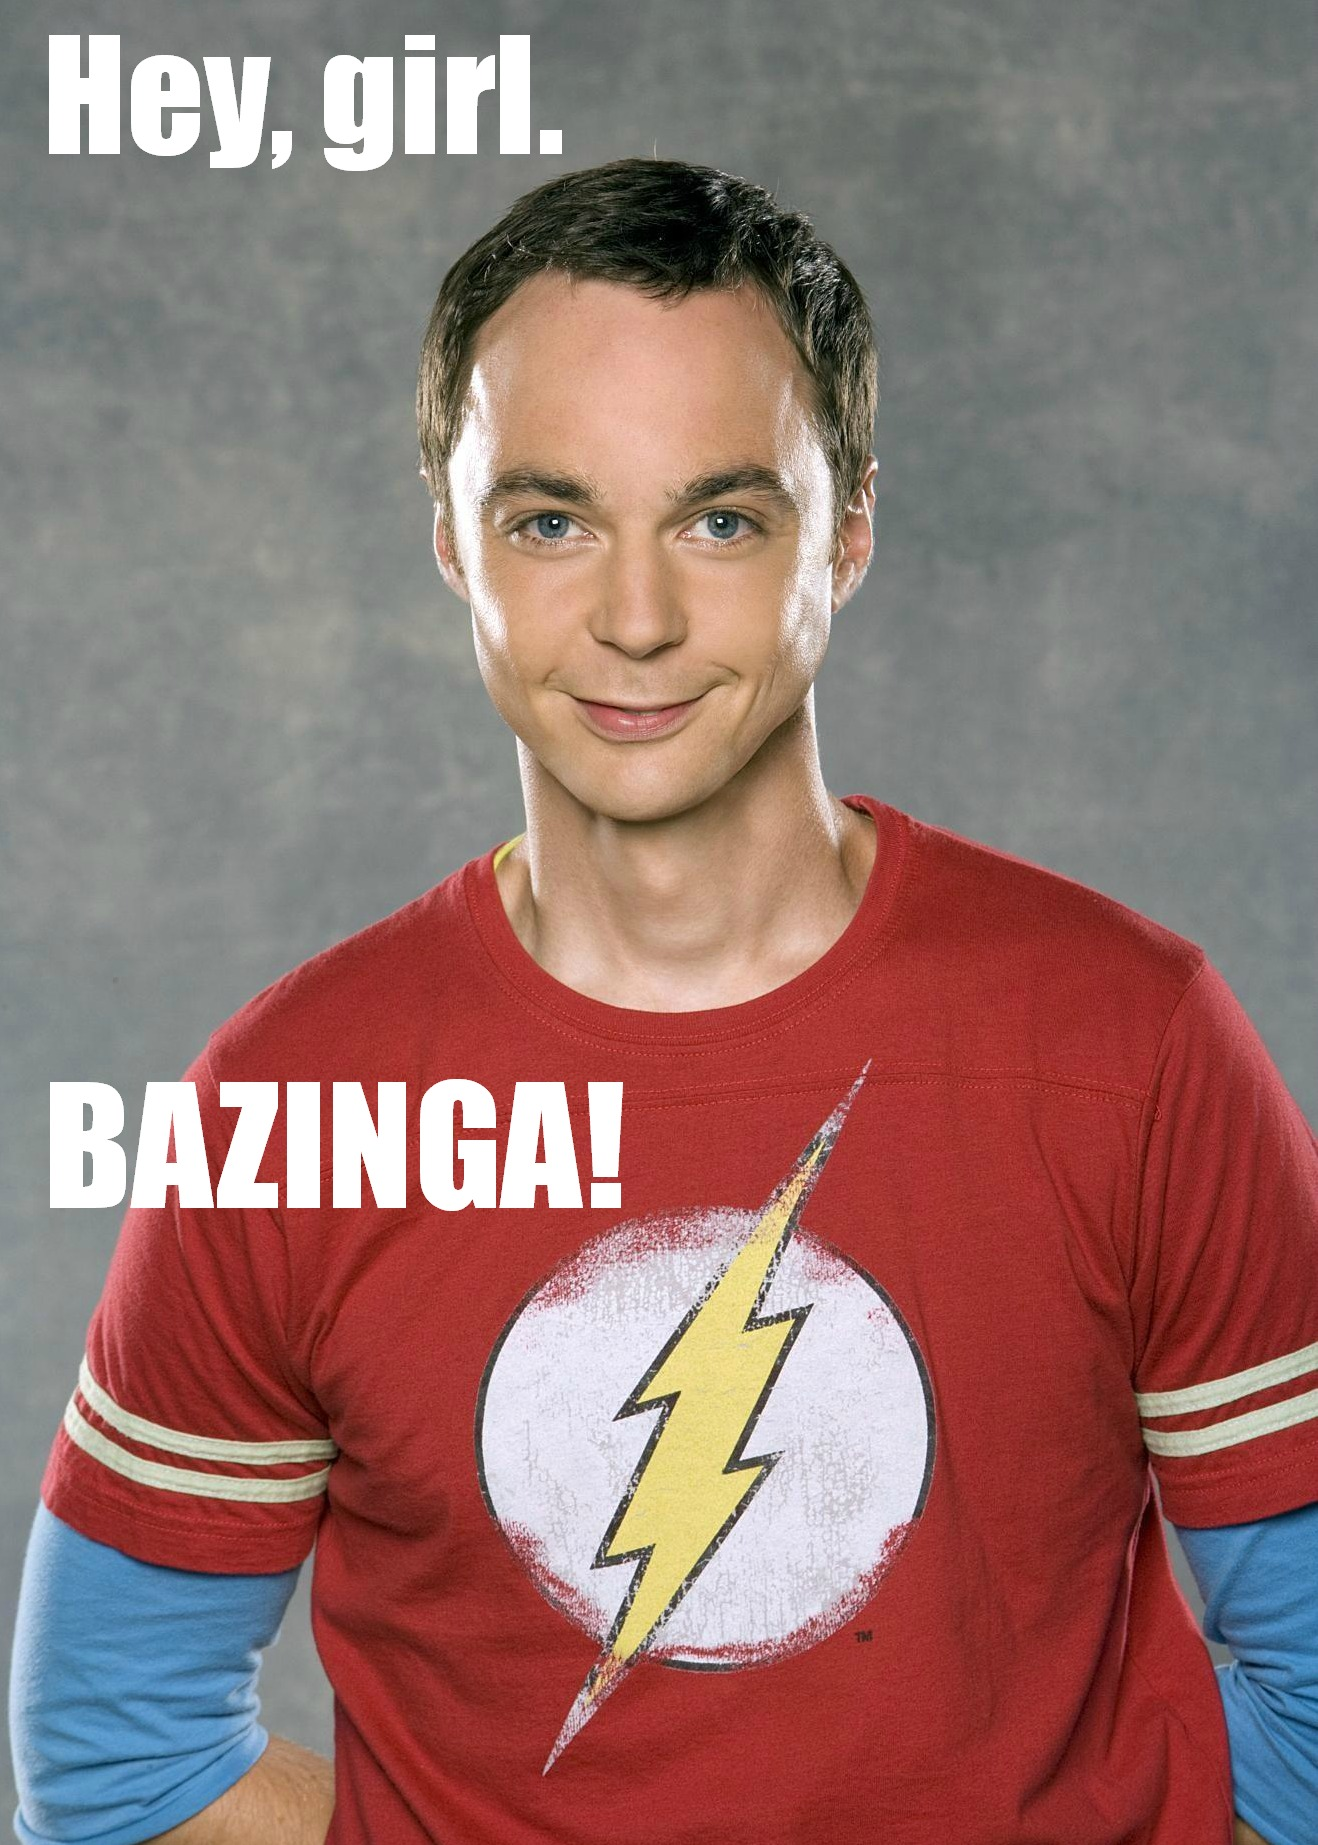 Bazinga Free Big Bang Theory Printables One Artsy Mama – Big Bang Theory Birthday Card